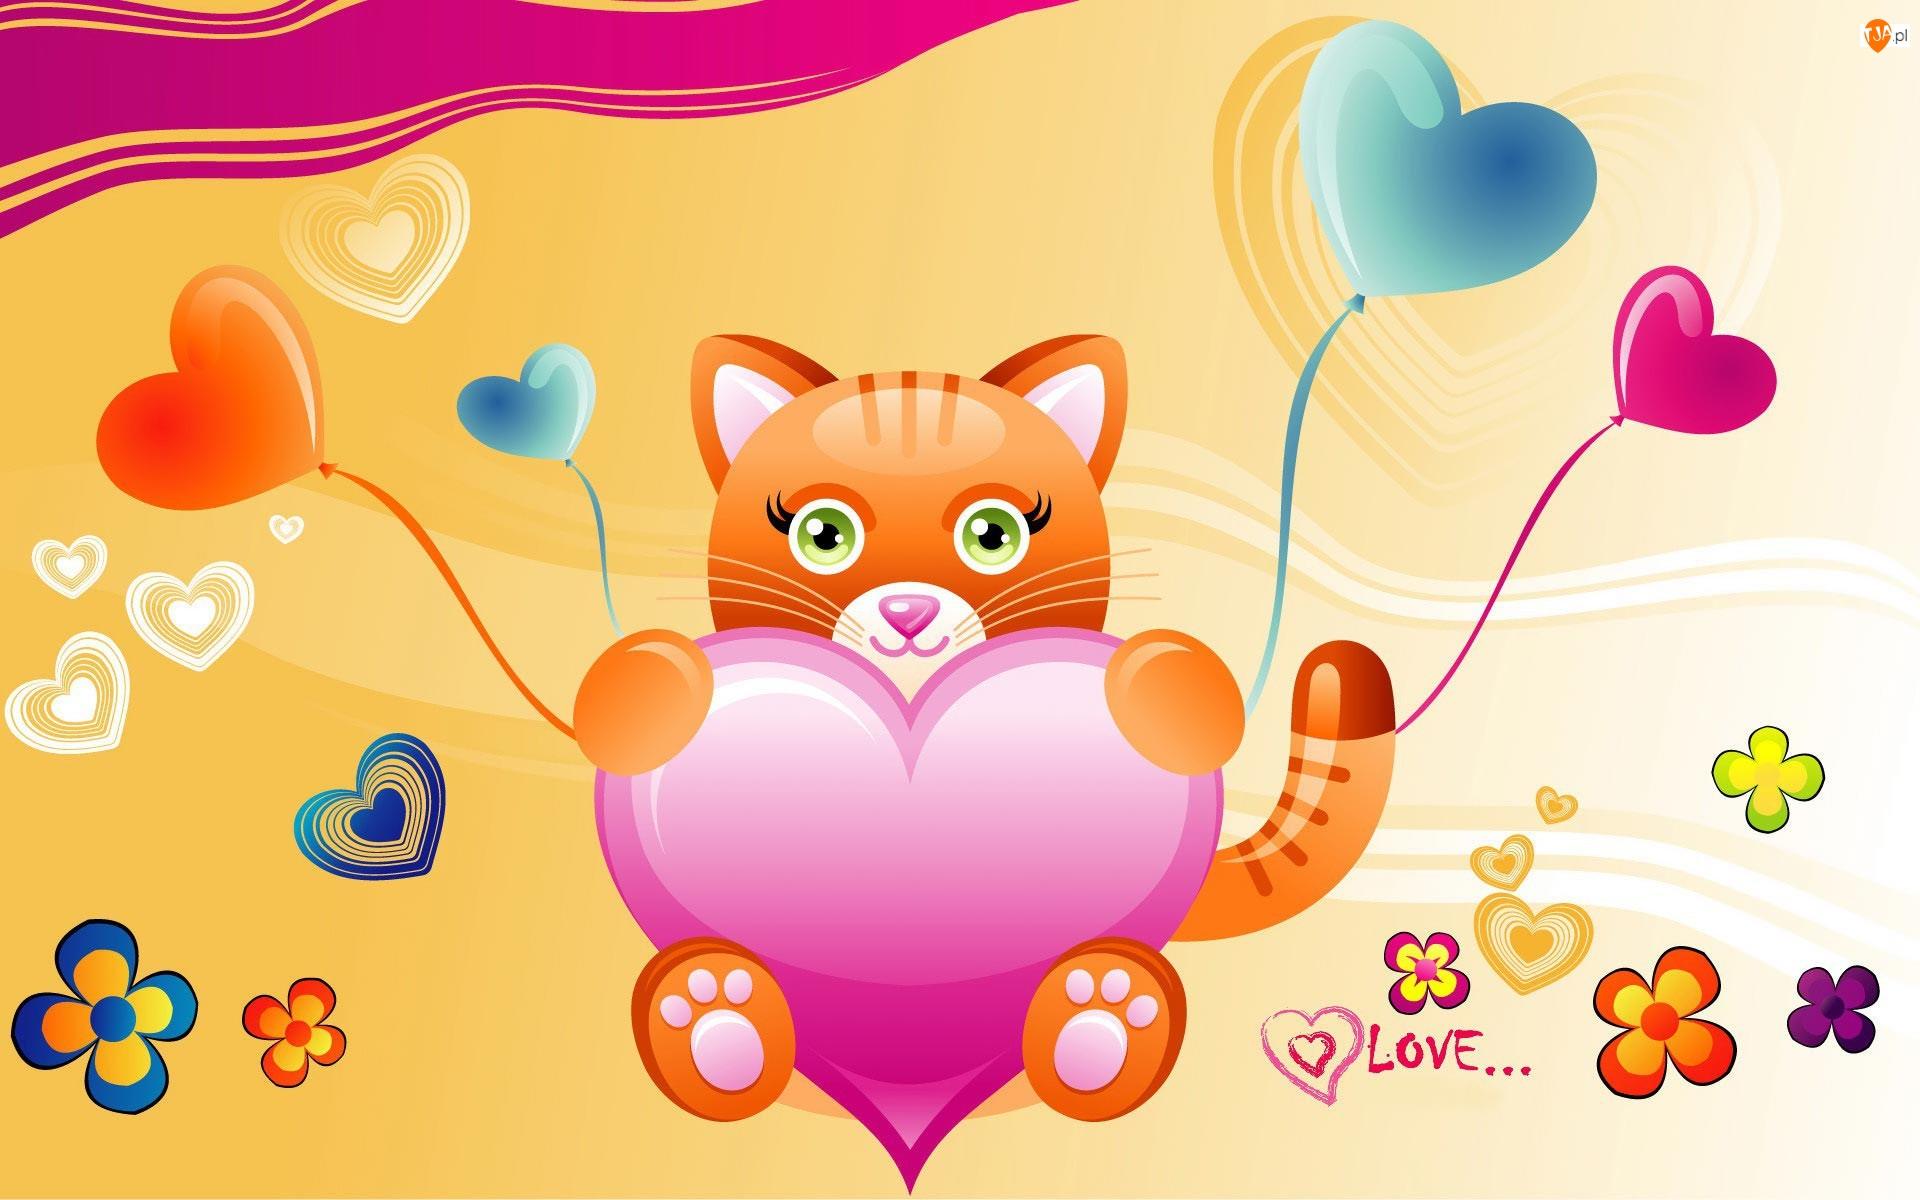 Grafika 2D, Miłość, Kotek, Walentynki, Serduszka